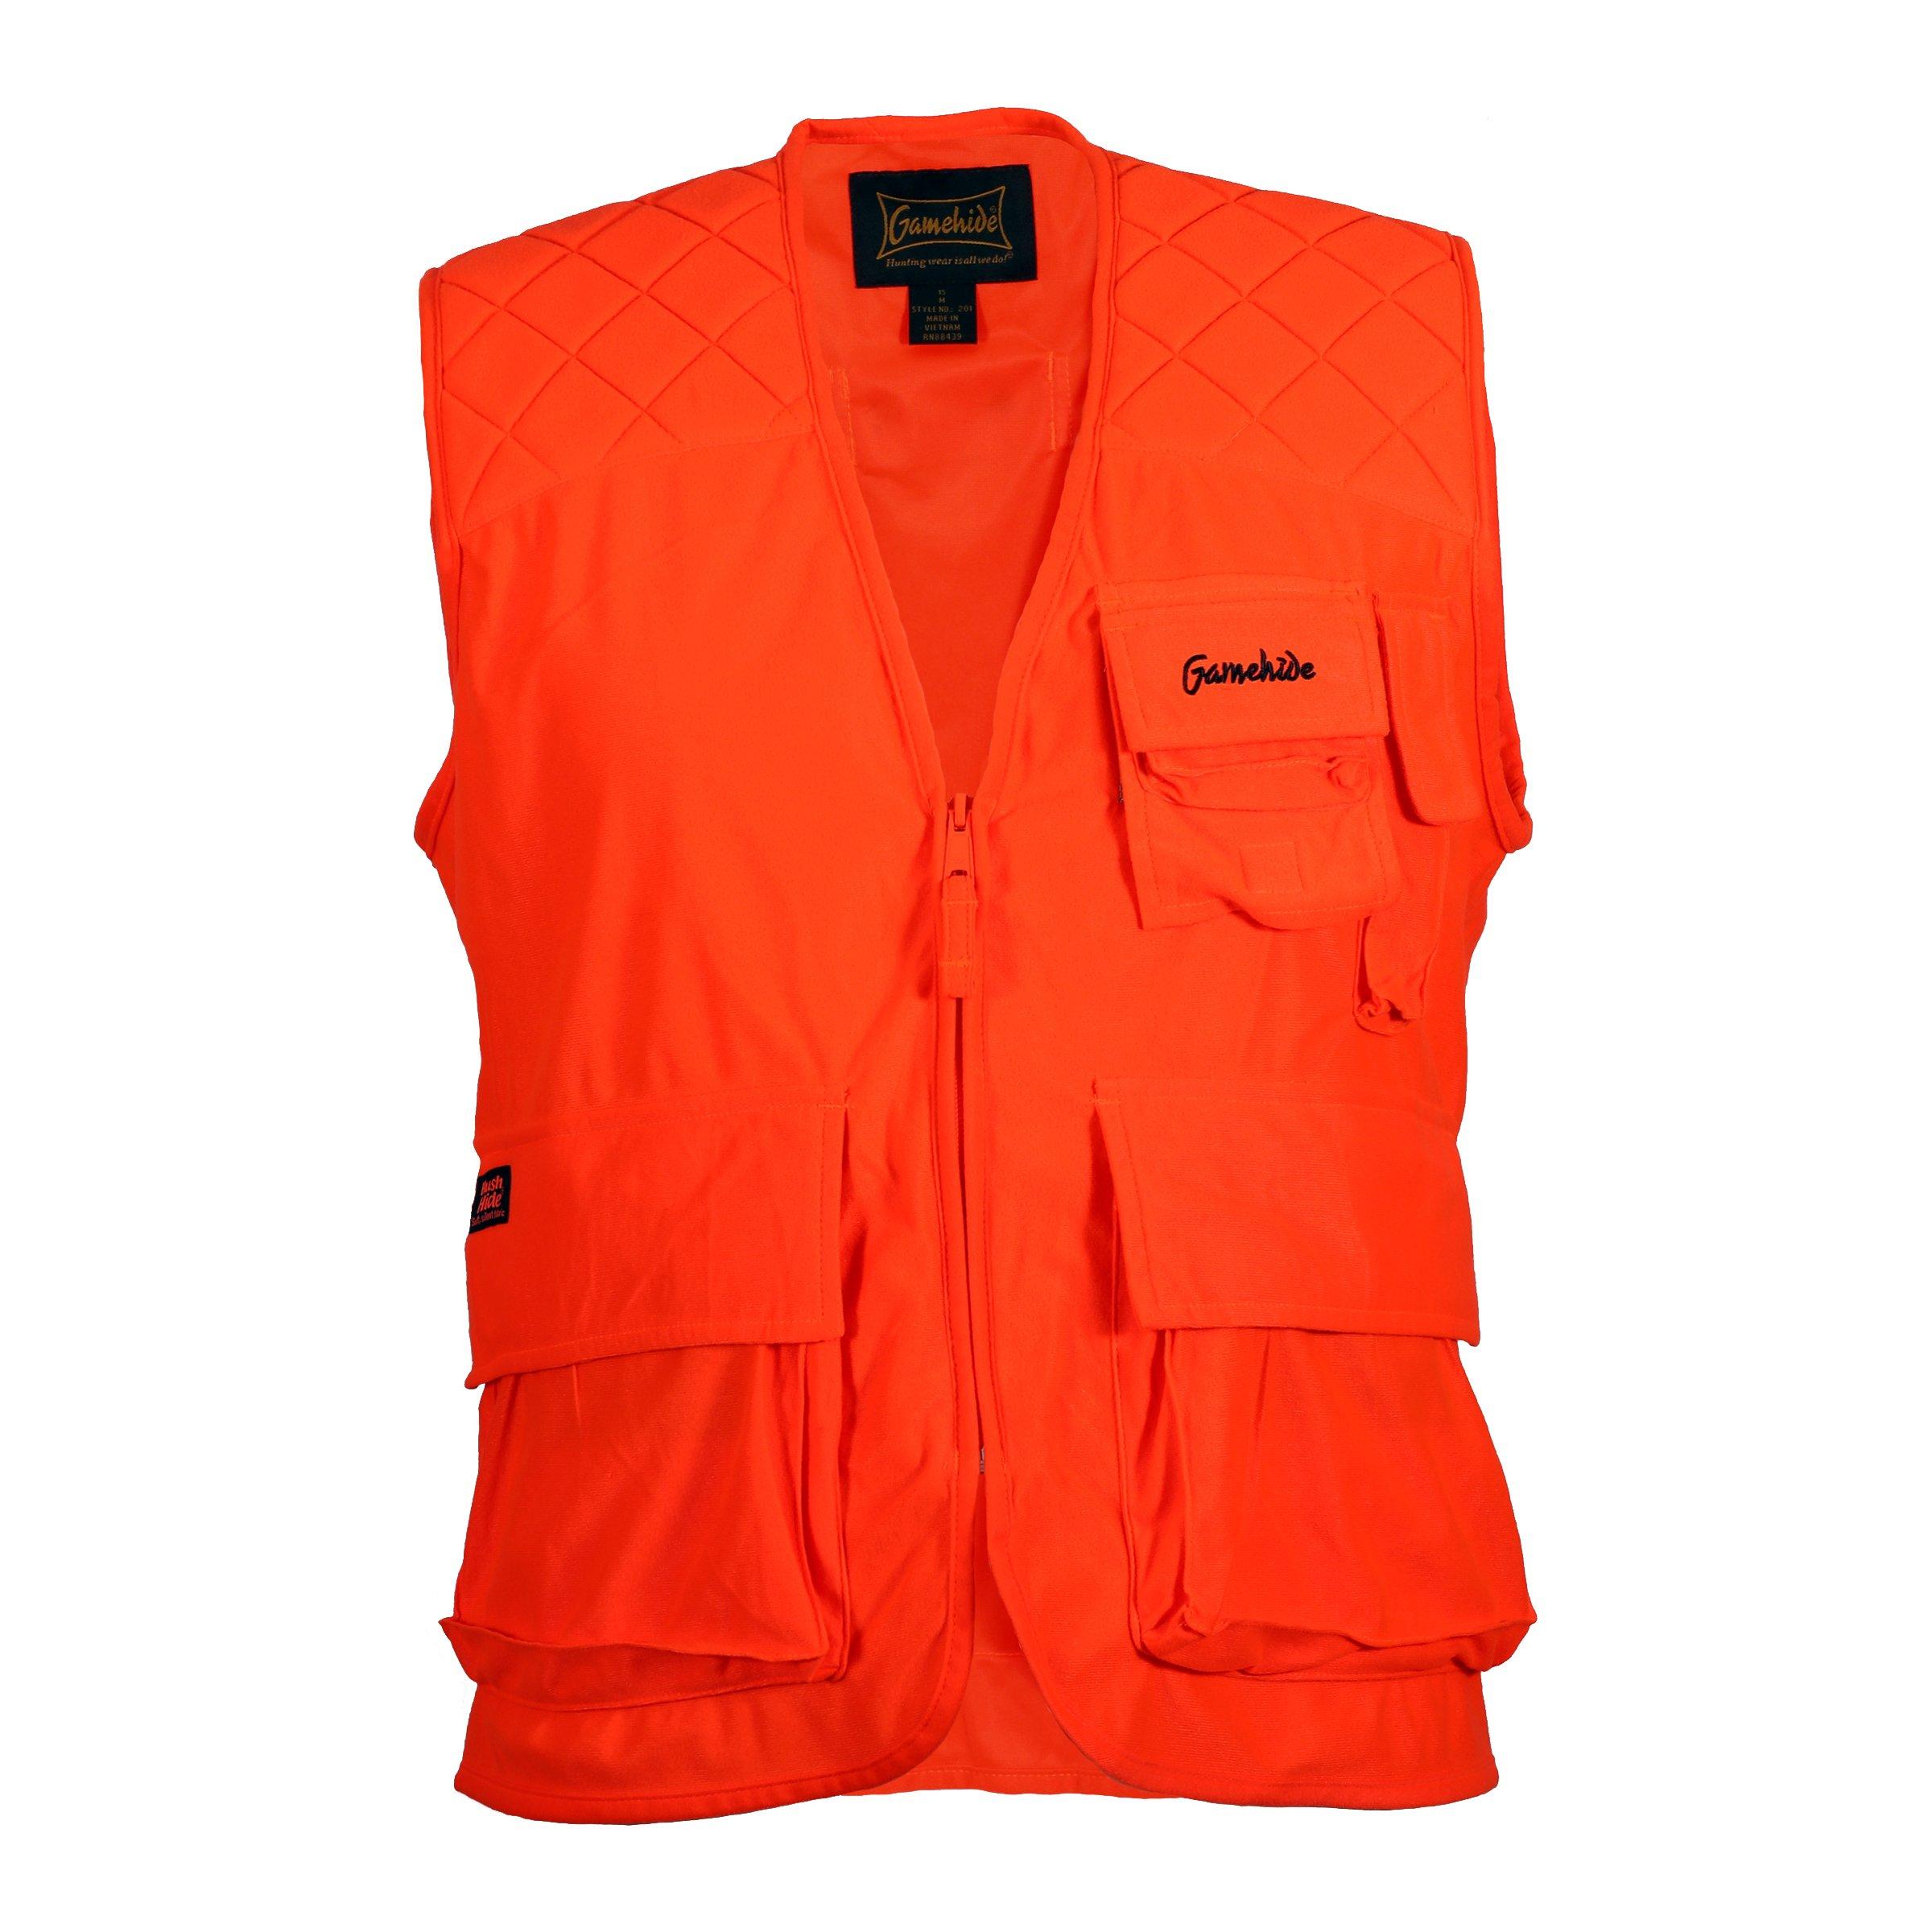 Gamehide Sneaker Big Game Vest Blaze Orange, Medium by Gamehide